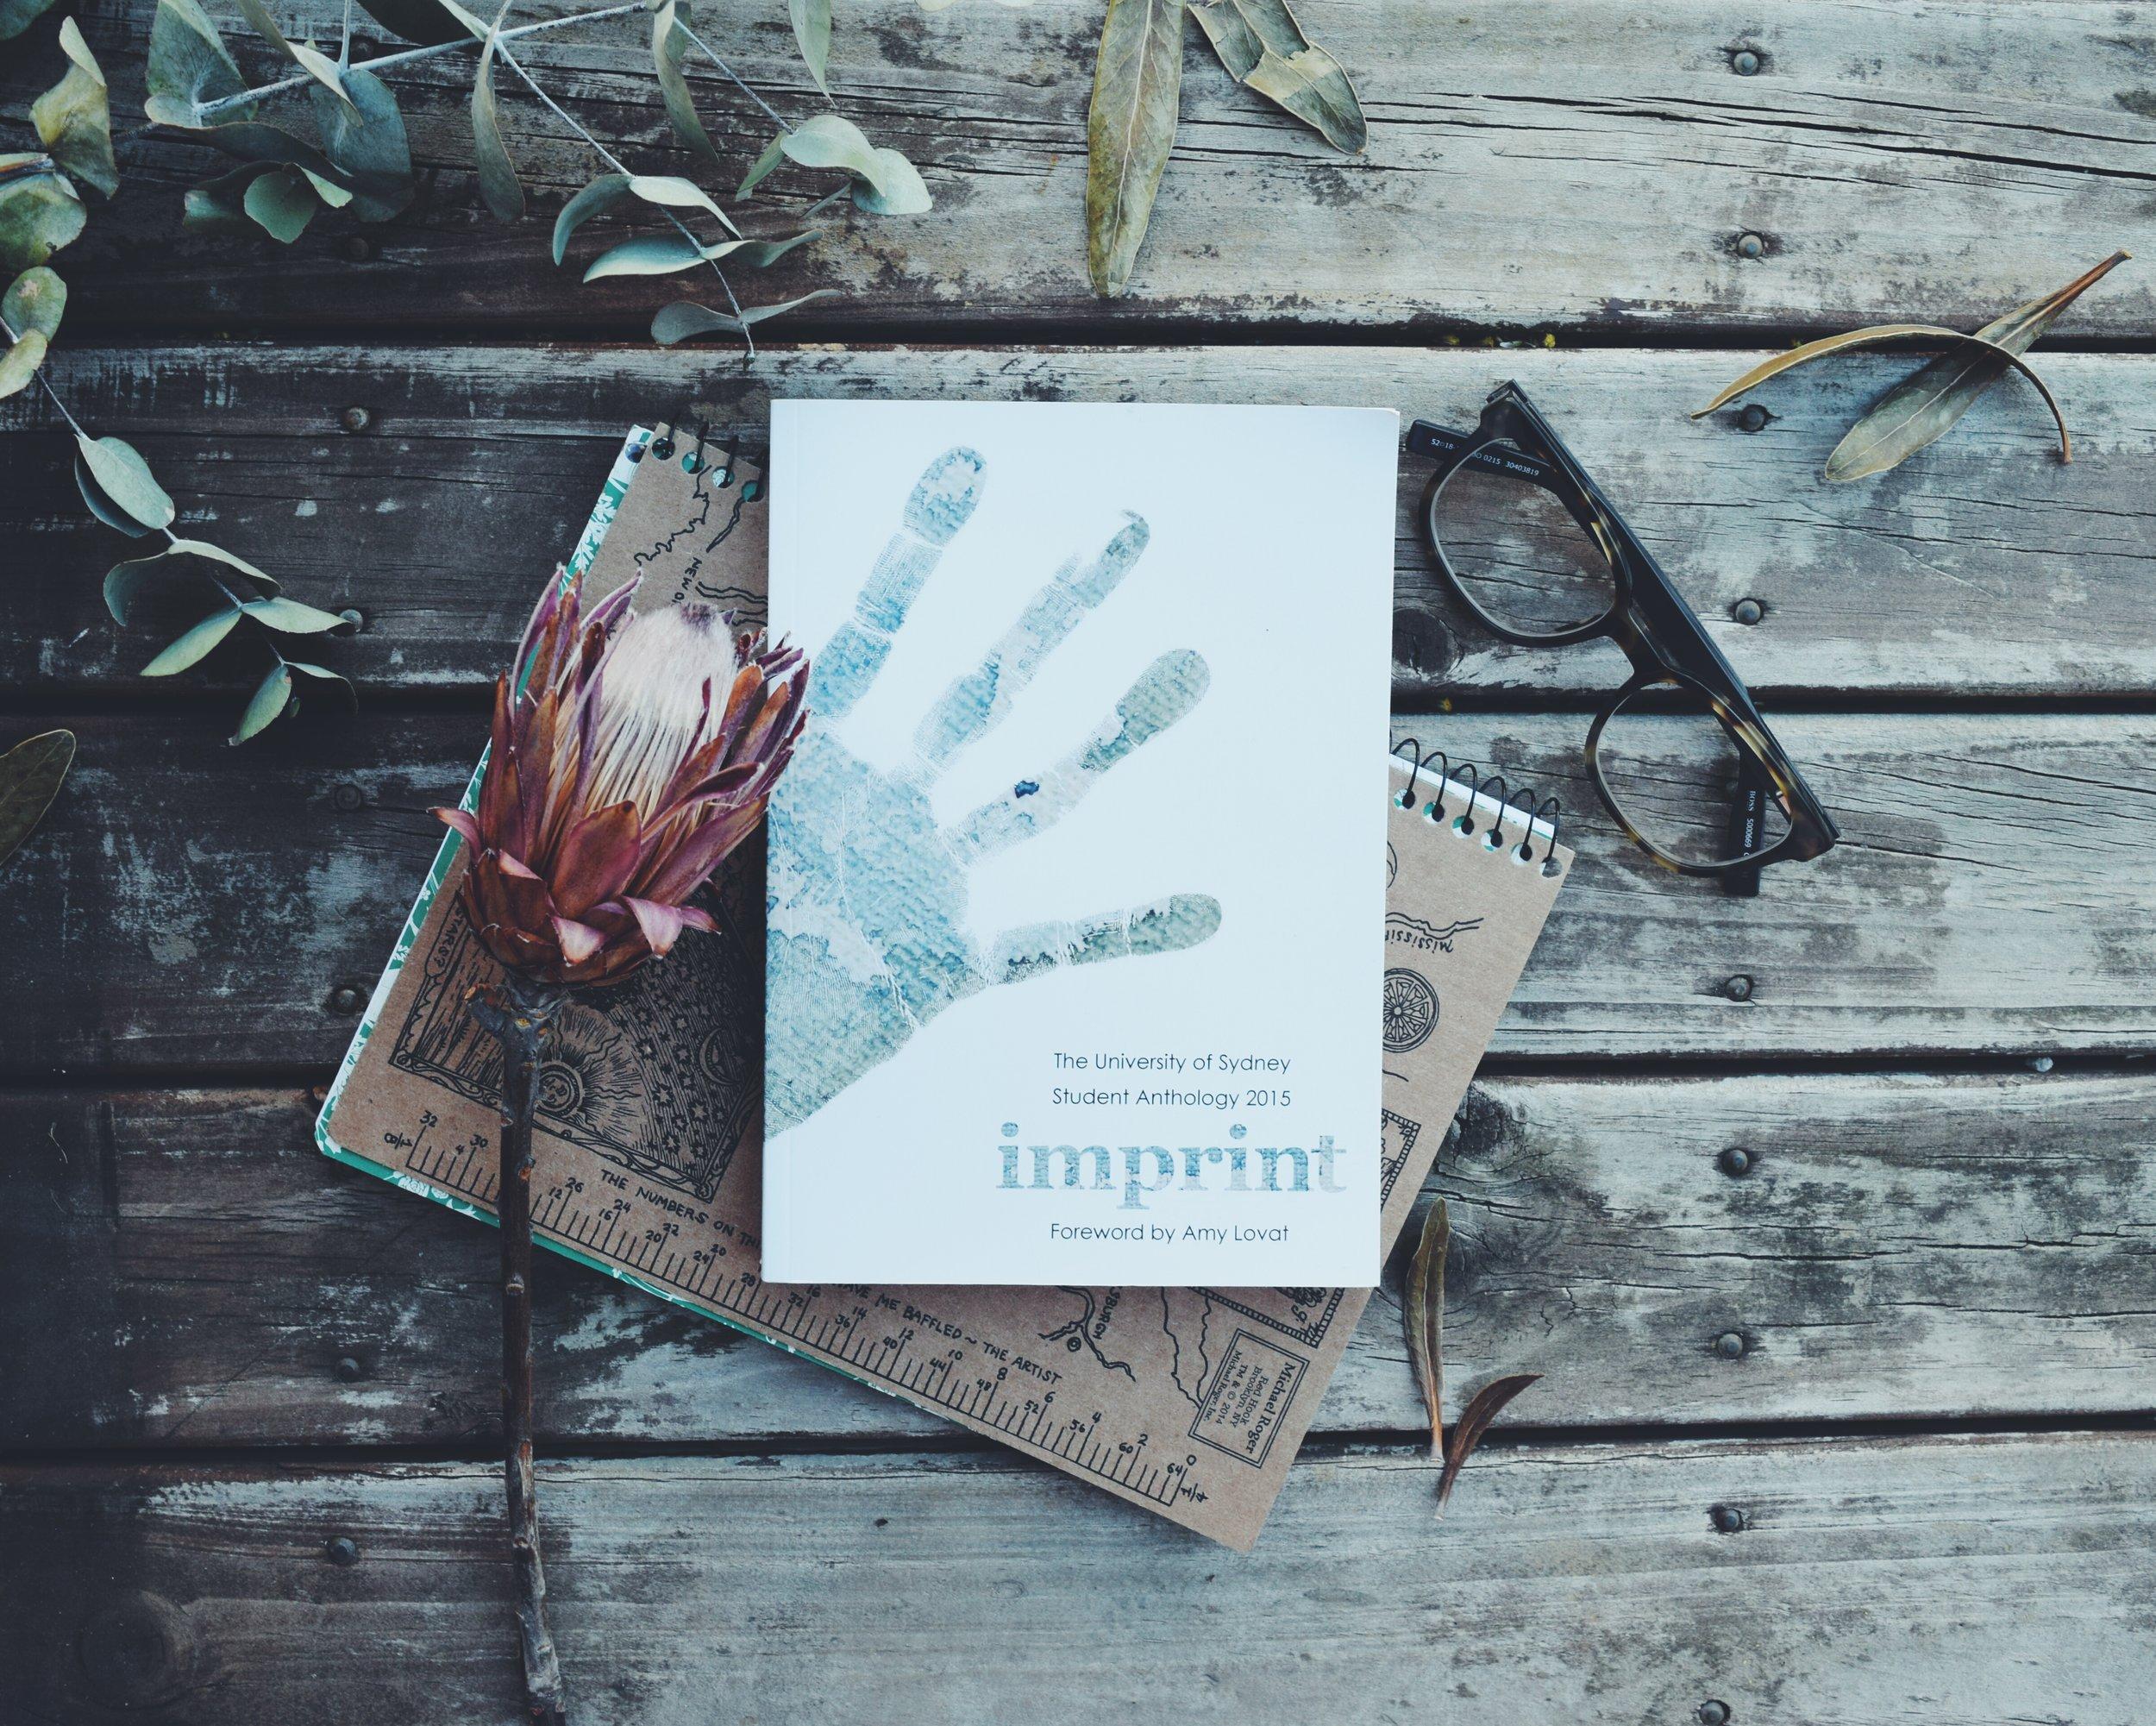 Imprint foreword Amy Lovat